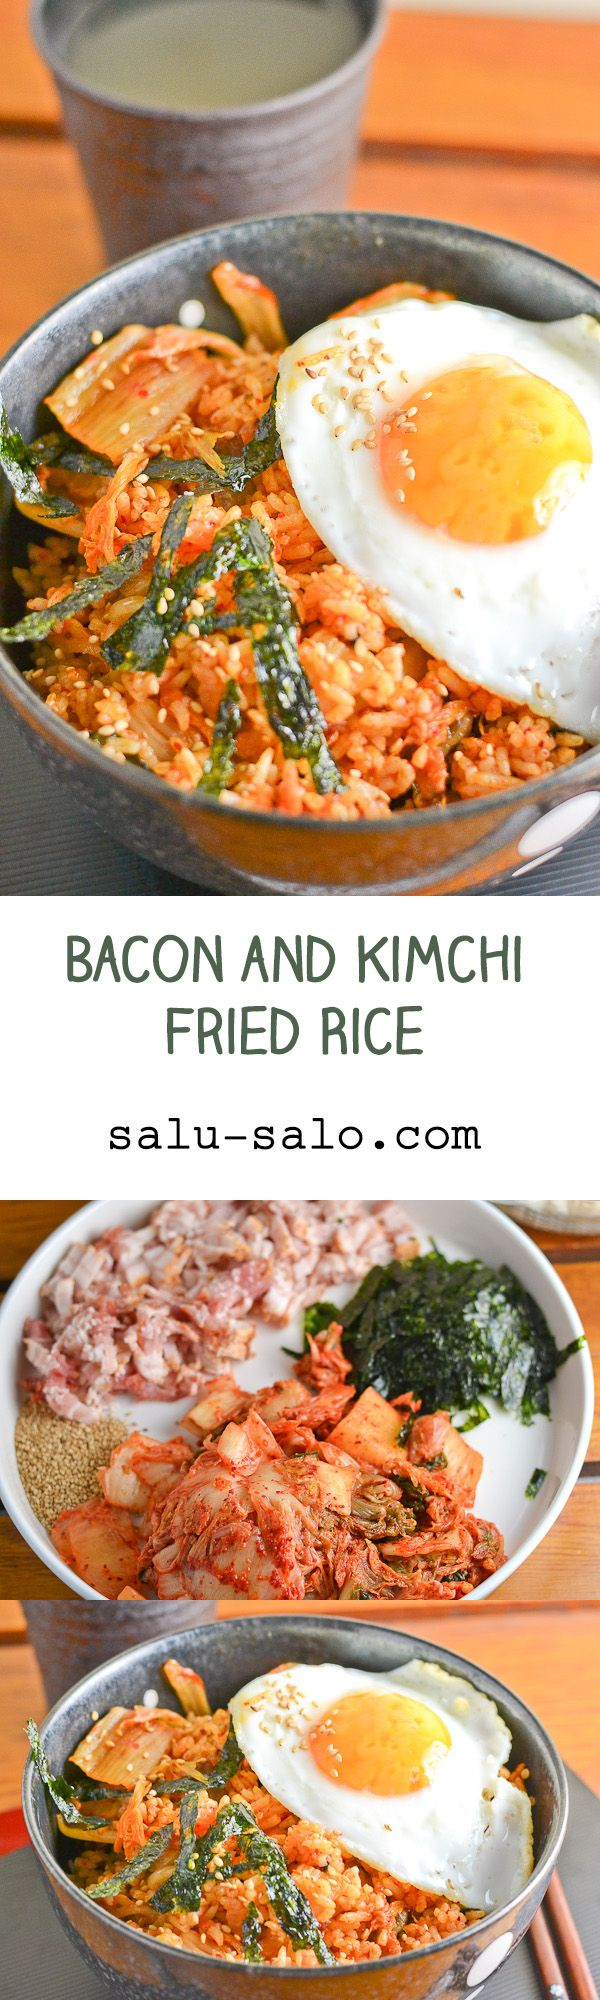 Bacon and Kimchi Fried Rice